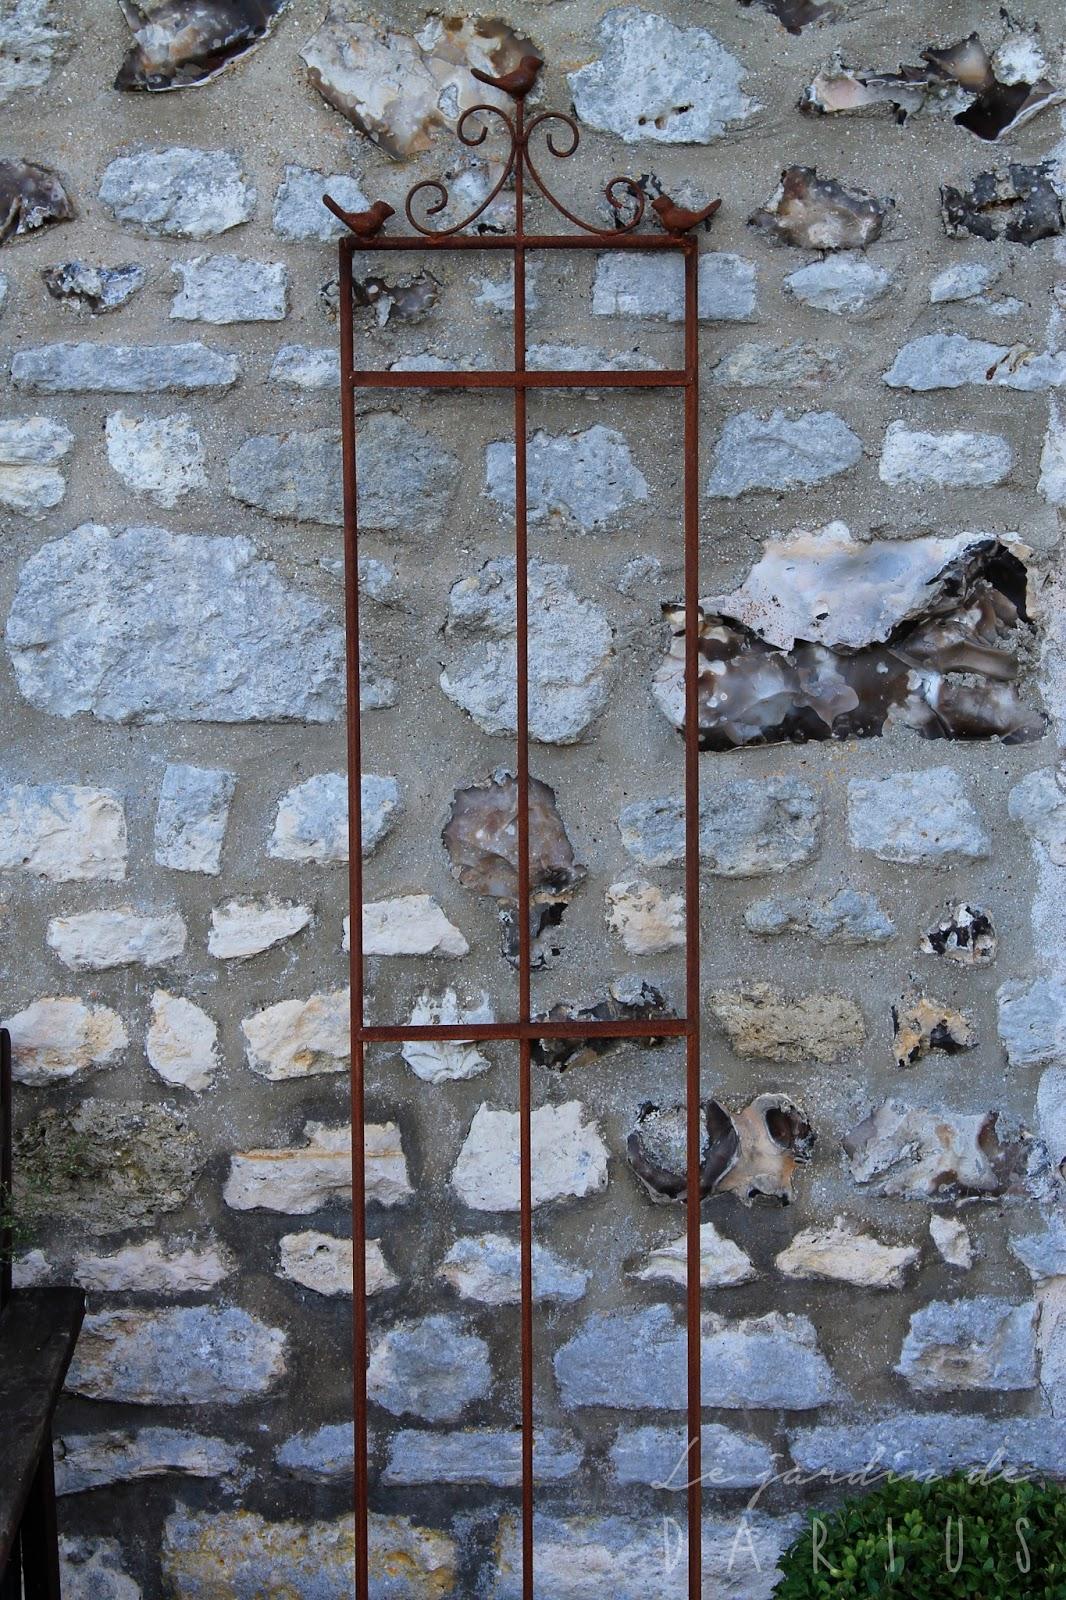 Le jardin de darius saint jean de beauregard 3 for M jardins miniac morvan